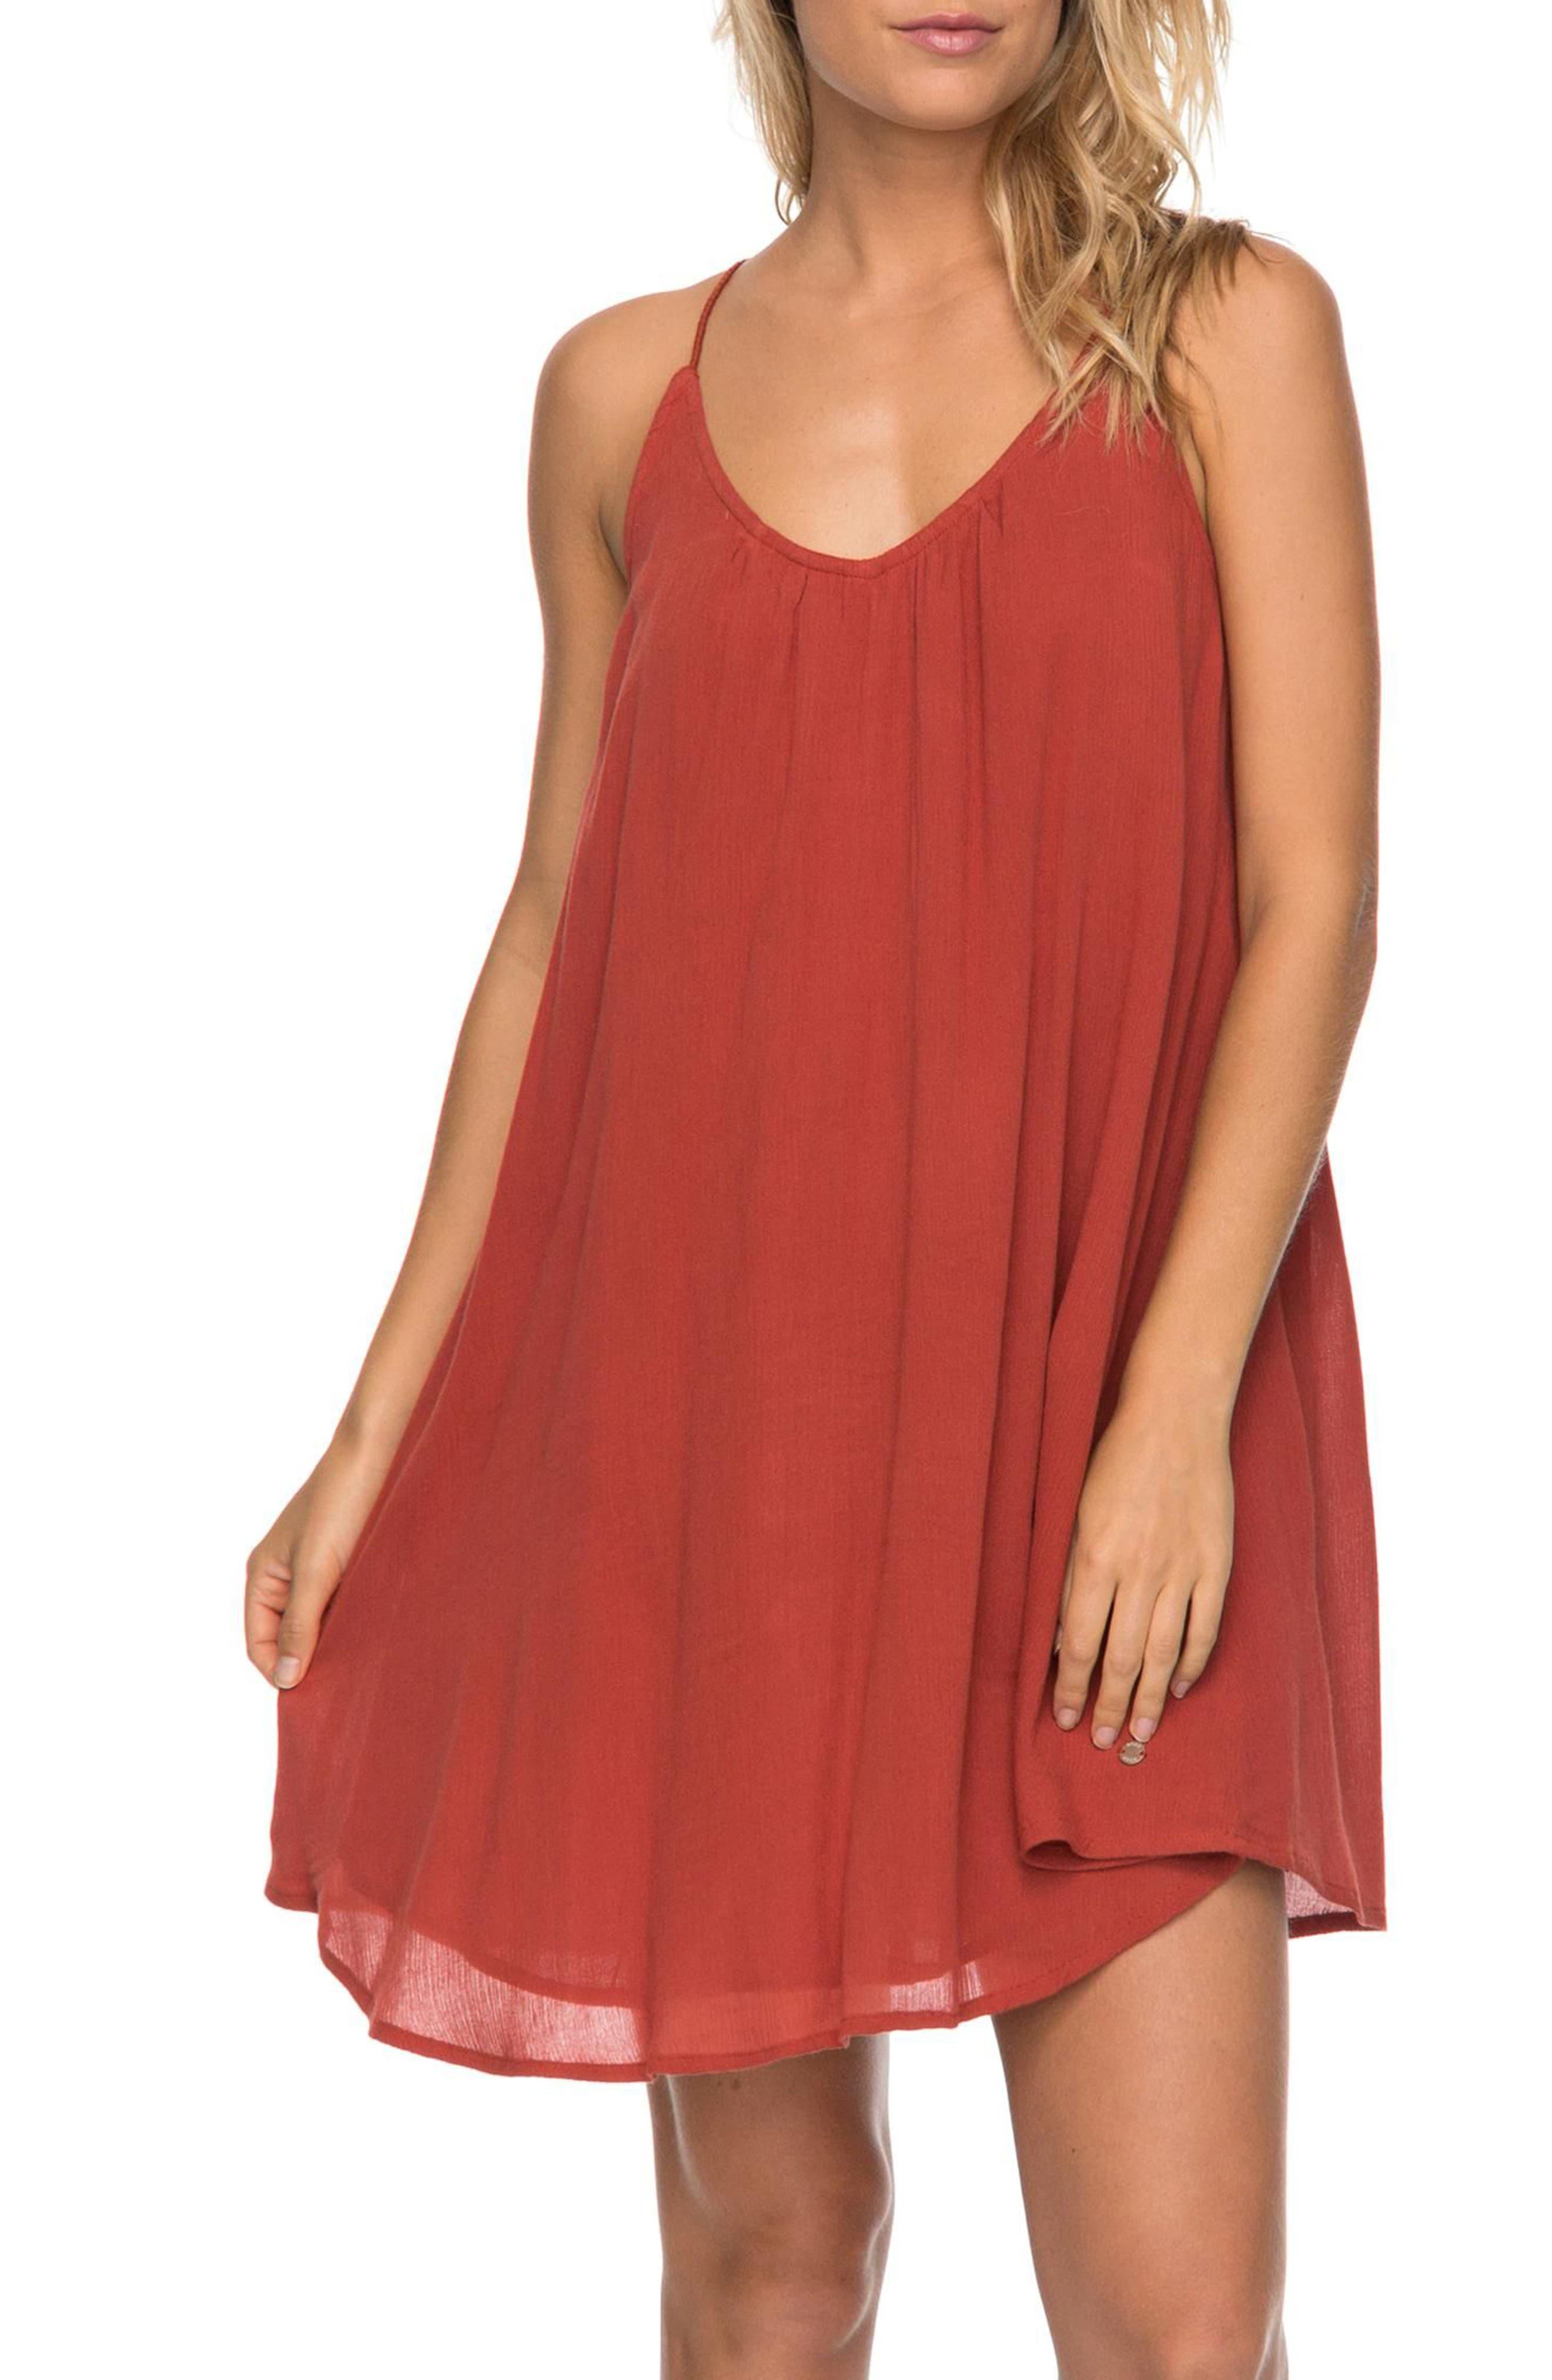 Great Intentions Trapeze Dress,                         Main,                         color, Tandoori Spice